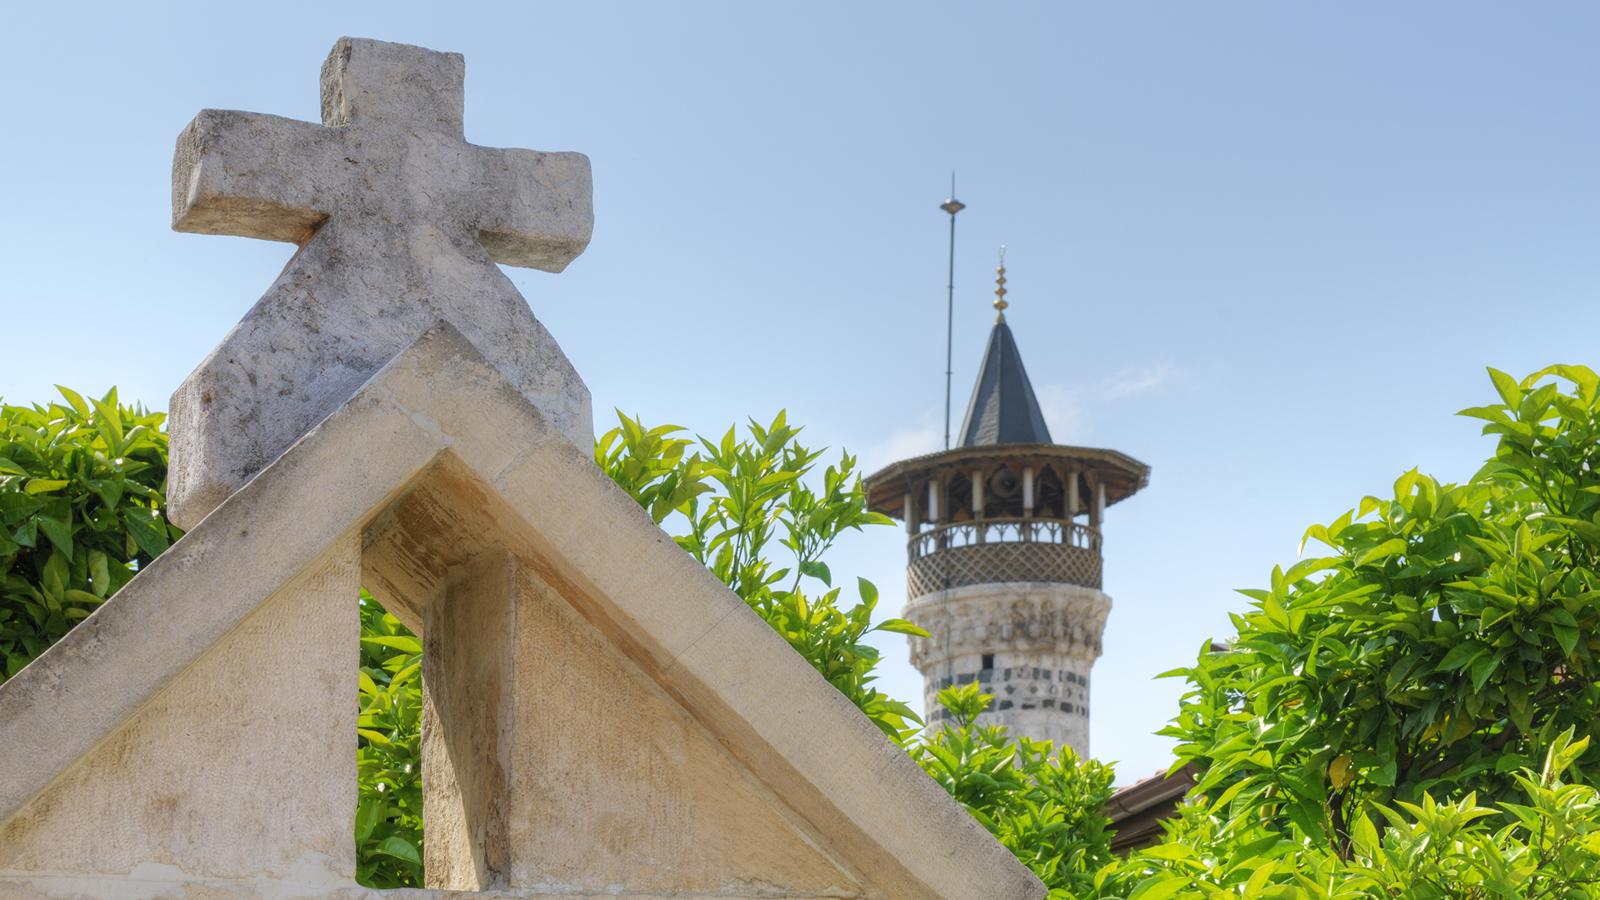 Stone Cross and Mosque Minaret